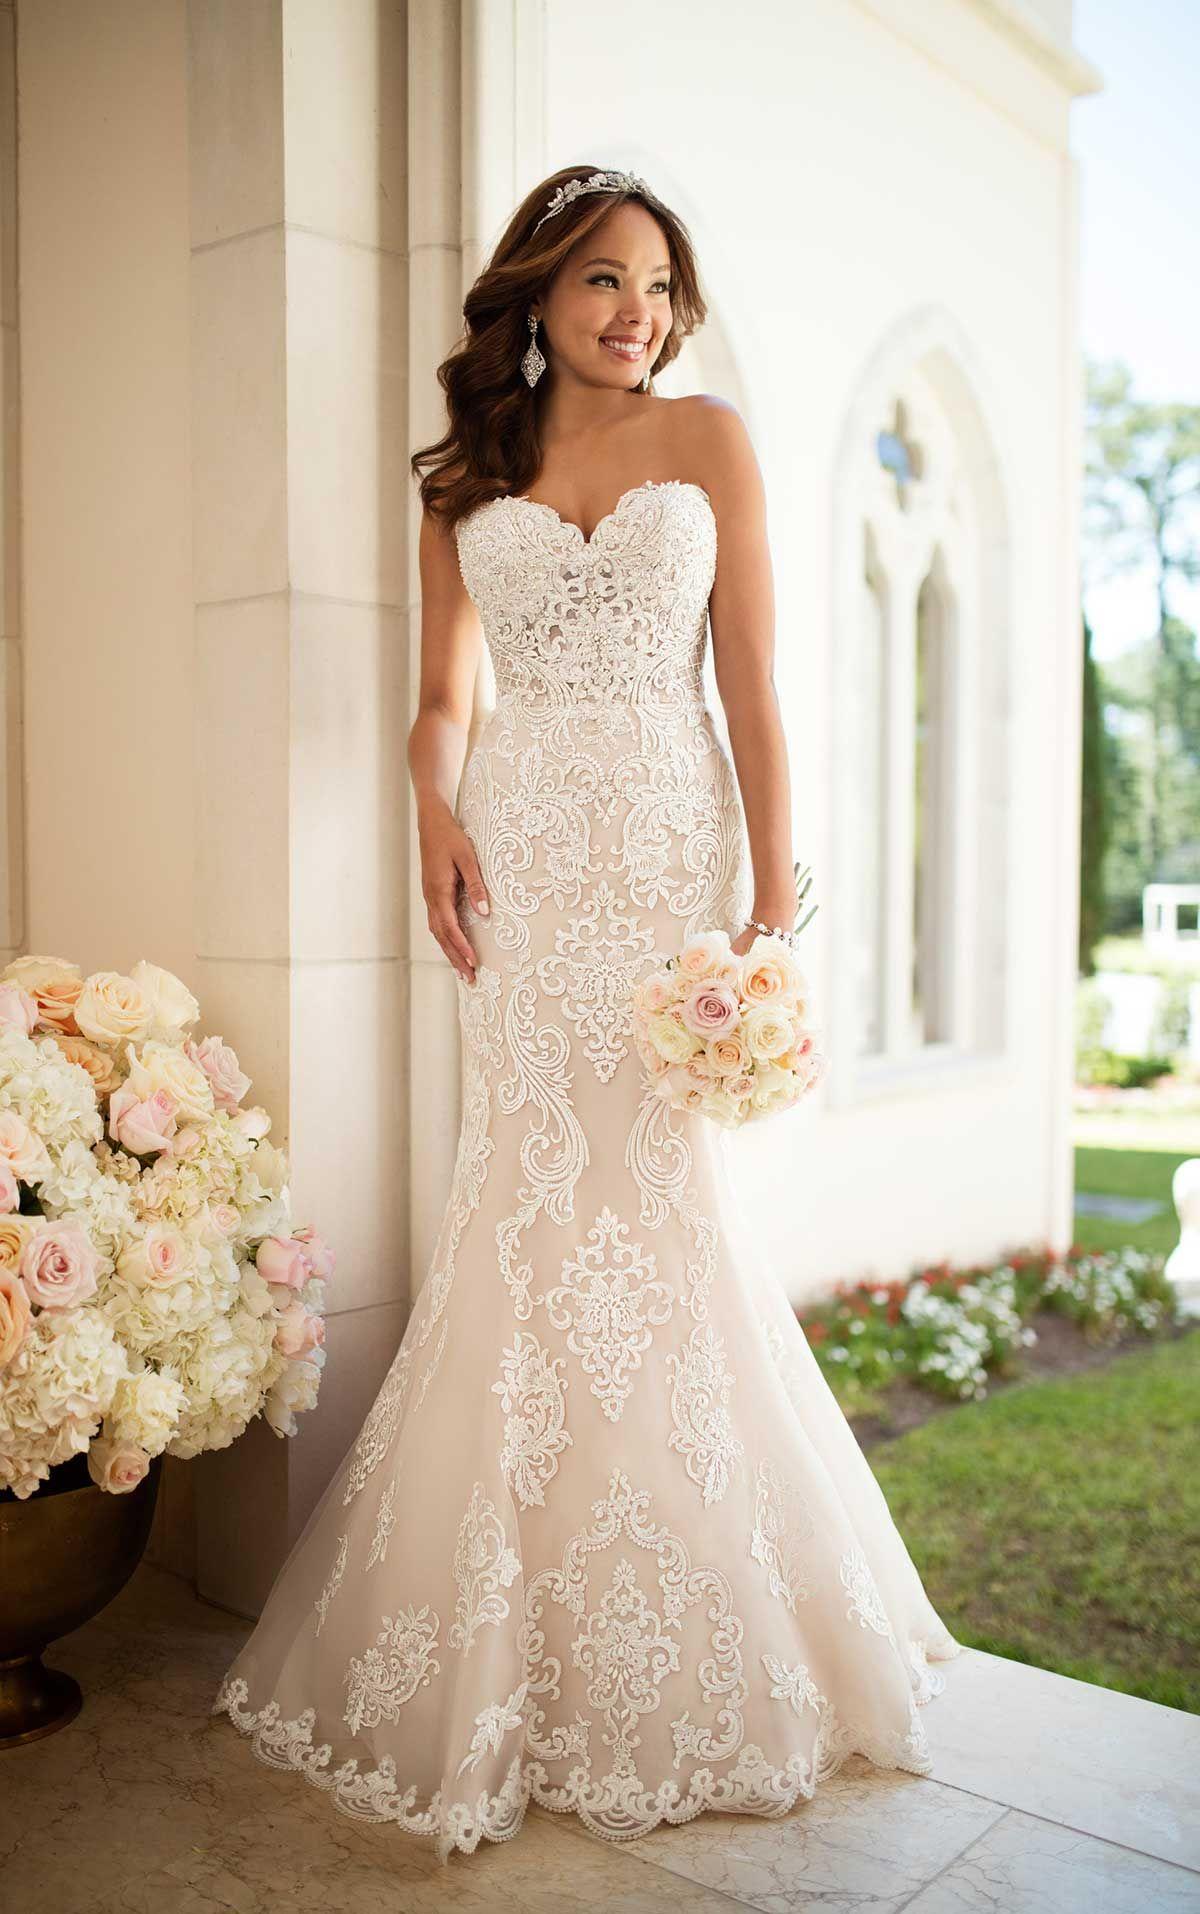 Elegant lace wedding dress stella york designer gowns and lace